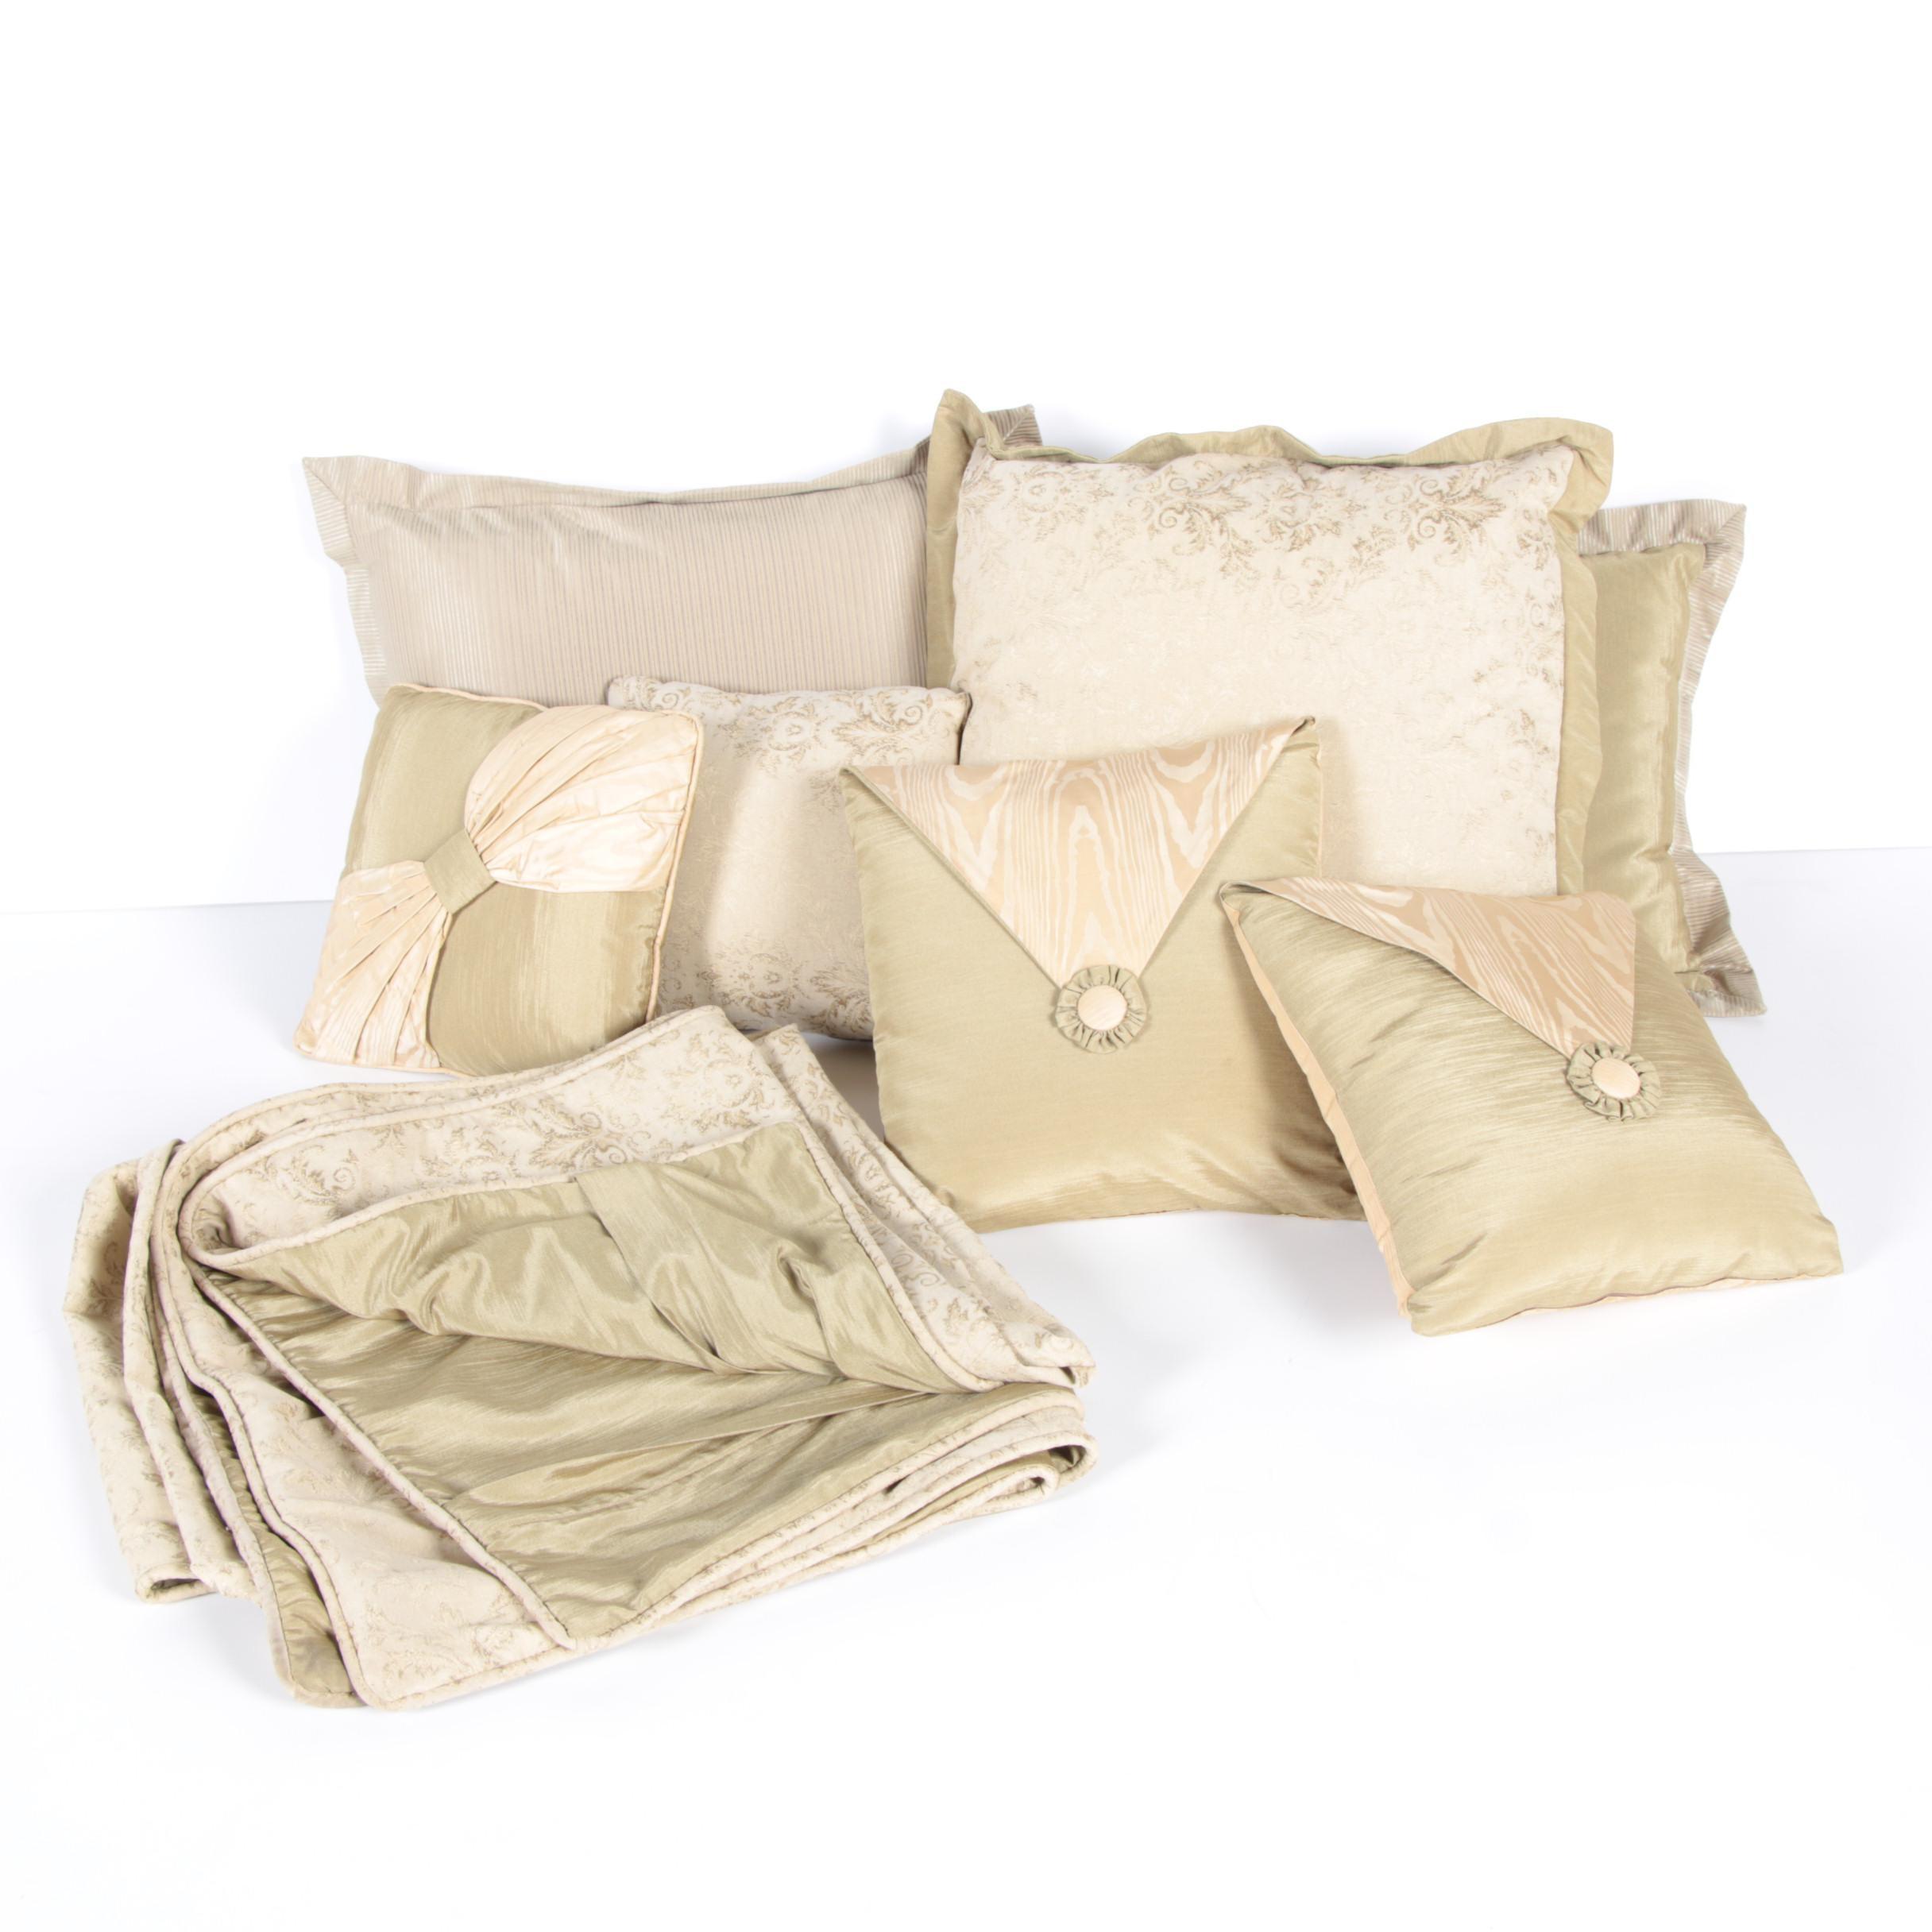 Damask Duvet with Matching Accent Pillows